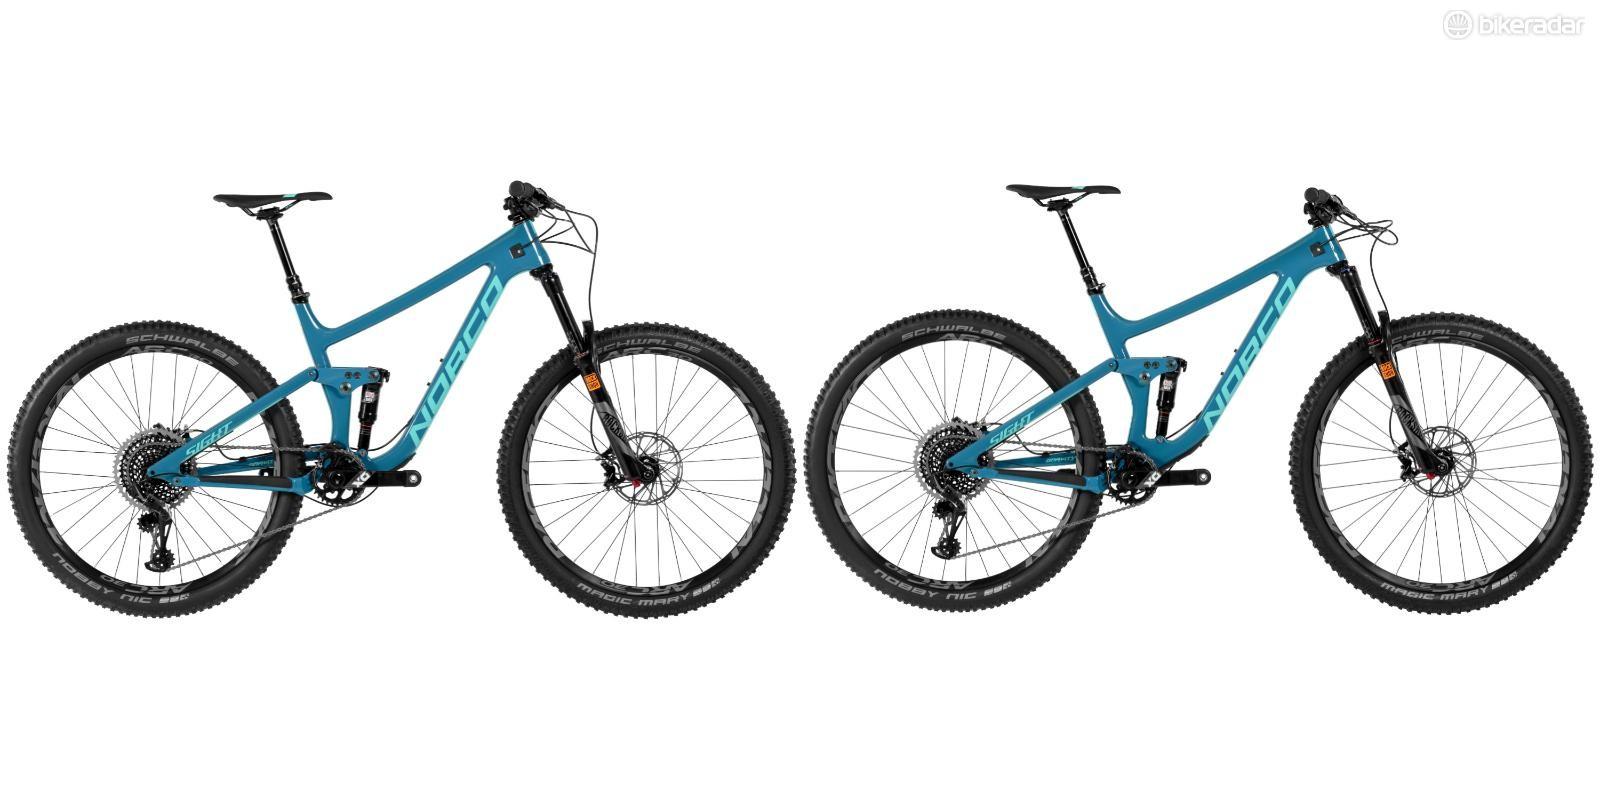 Norco takes aim at a new Sight - BikeRadar